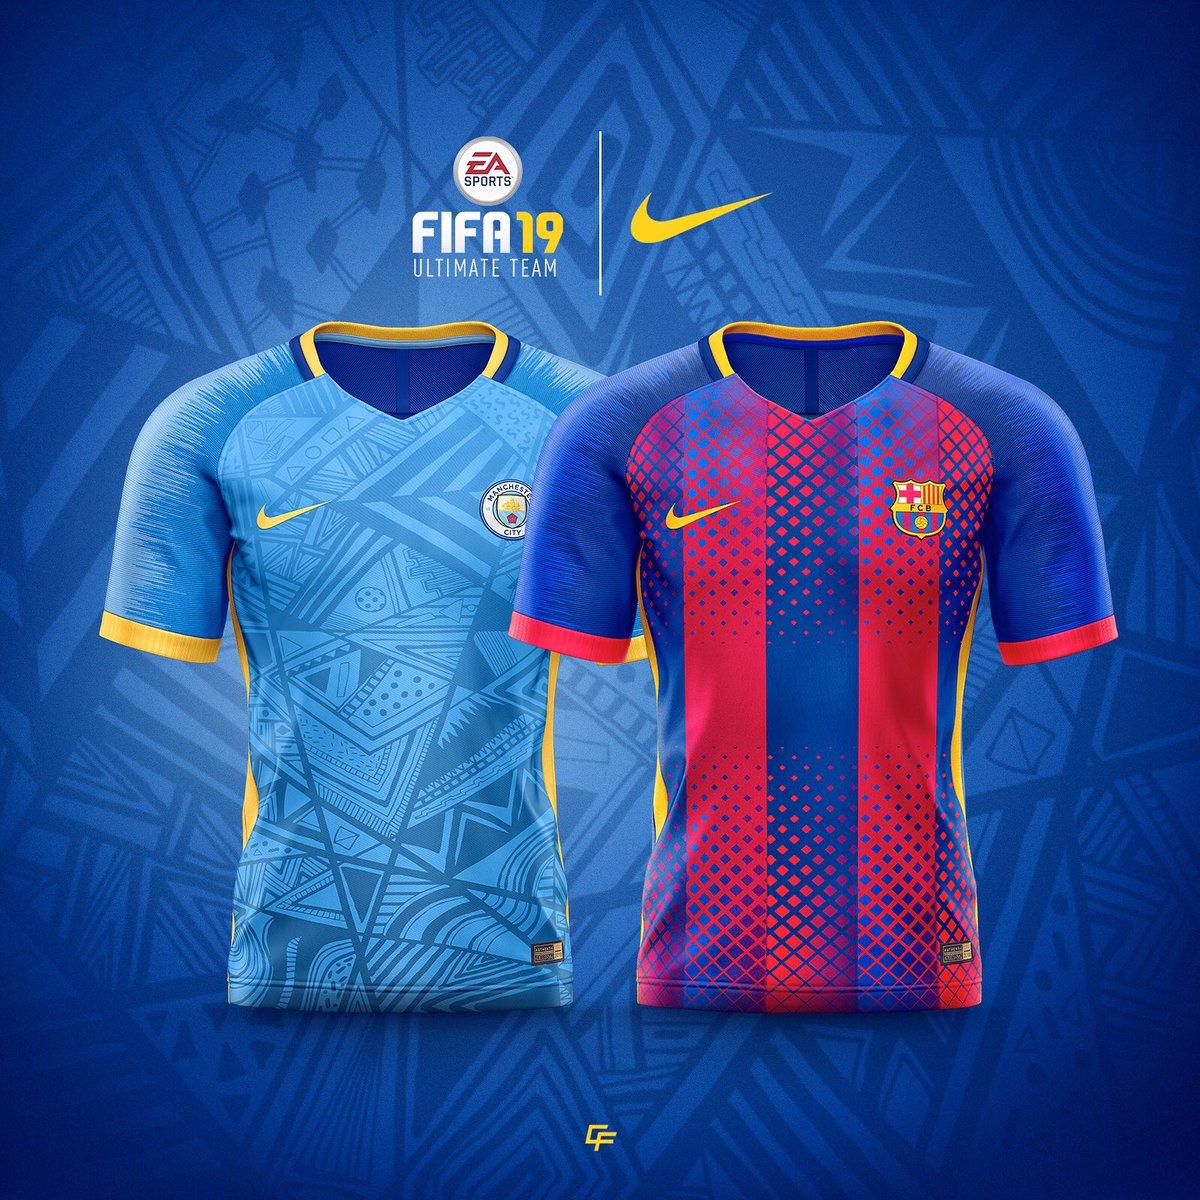 Sahil On Twitter Nike X Fifa 19 Custom Club Kits Just For The